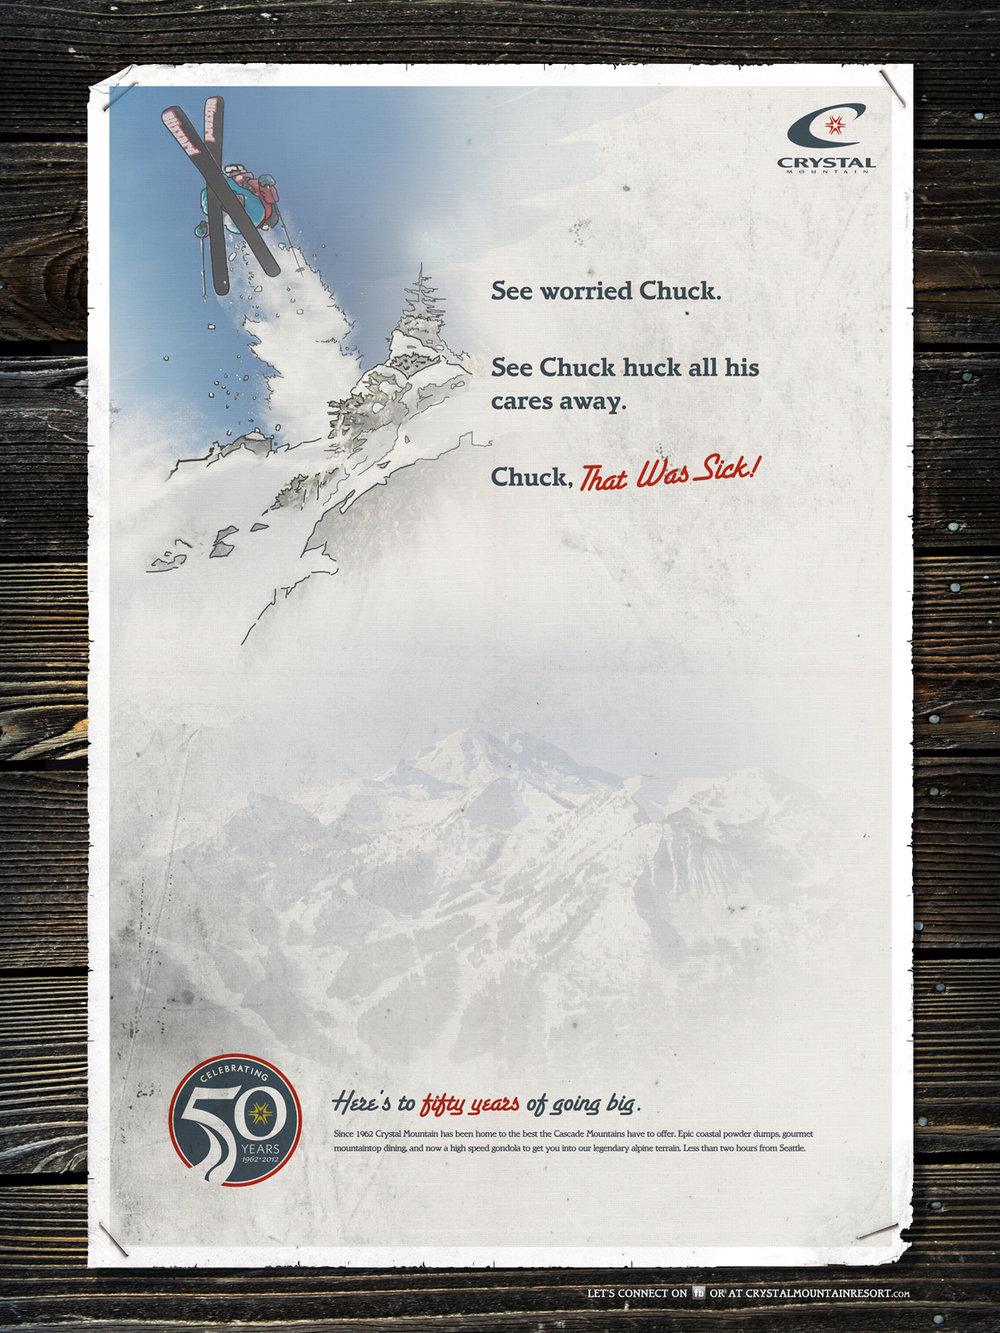 Crystal Mountain Print Advertising 07.jpg